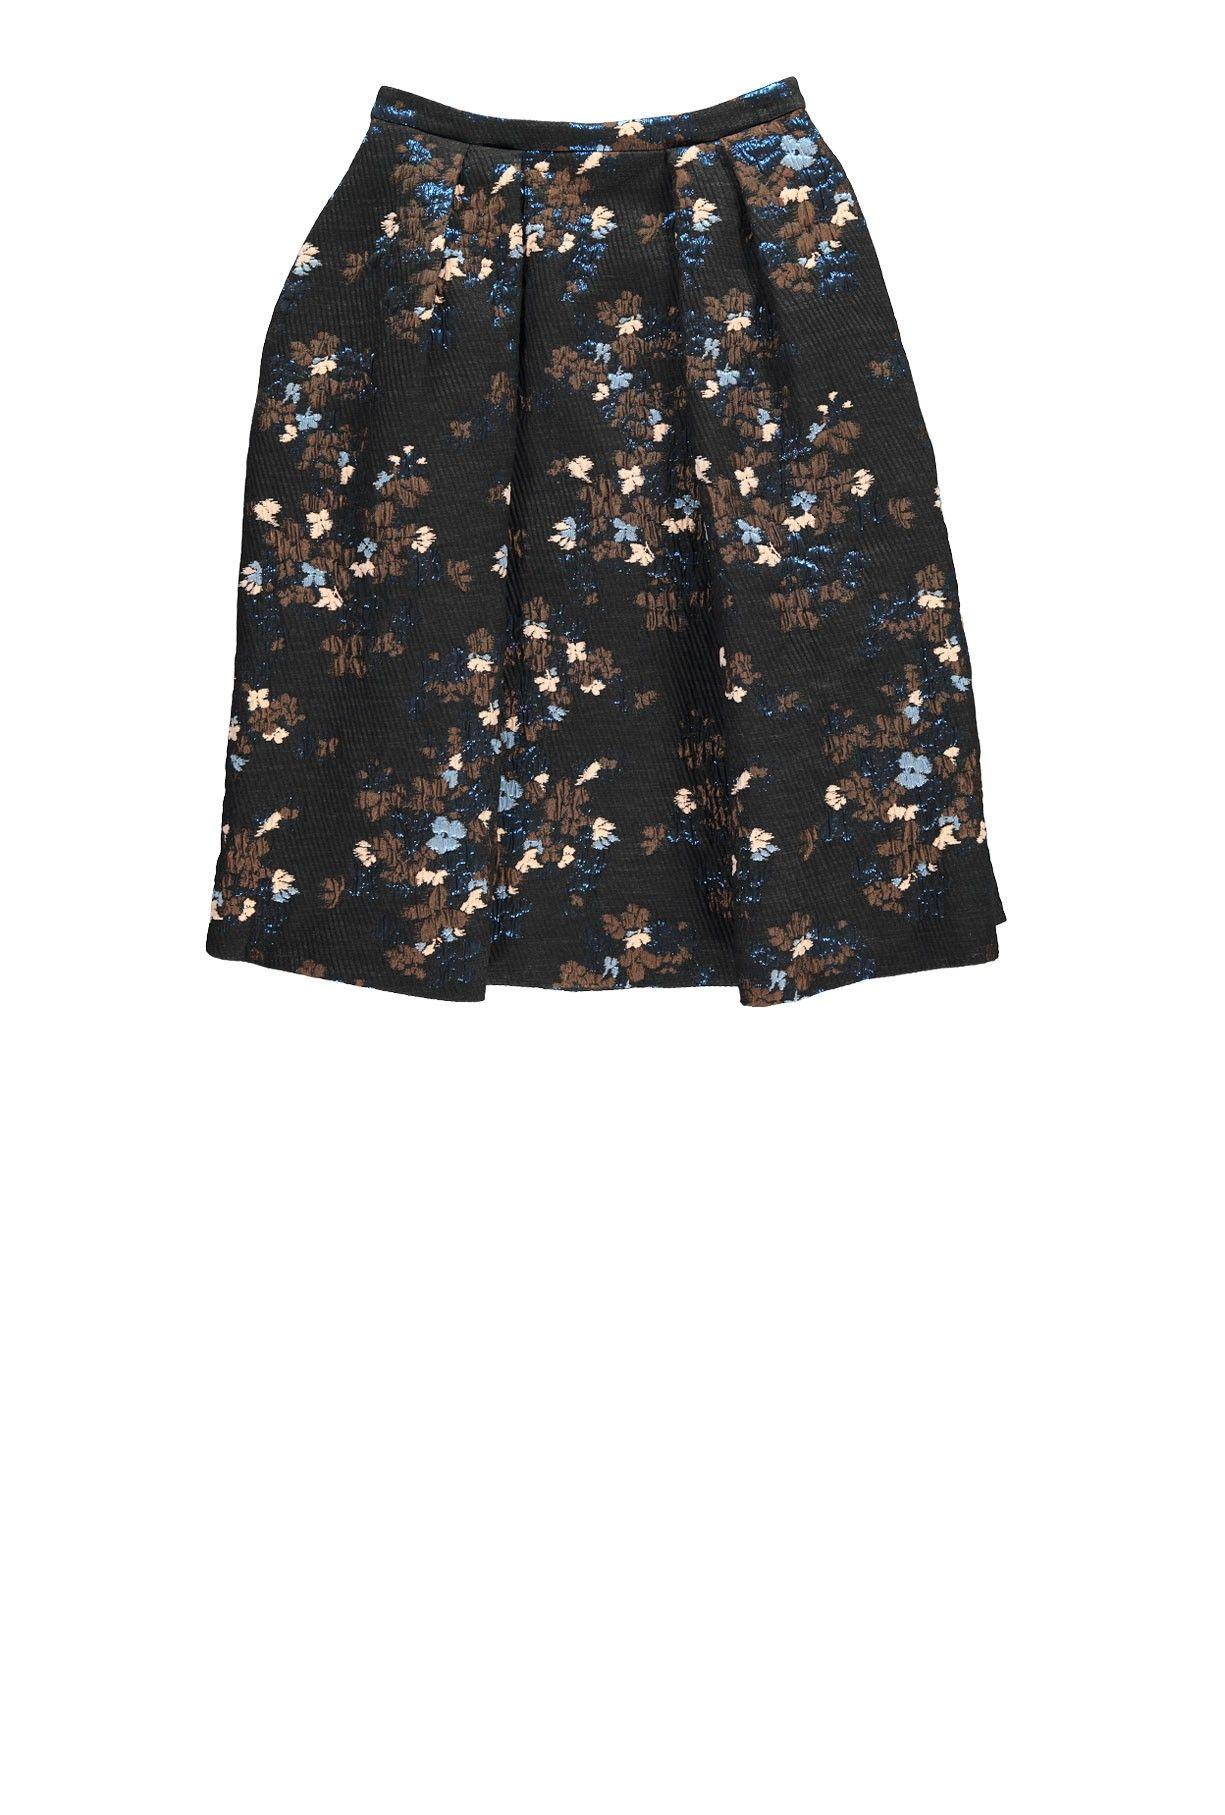 13fc9b76fd255e Omni skirt - Essentiel Antwerp Belgium